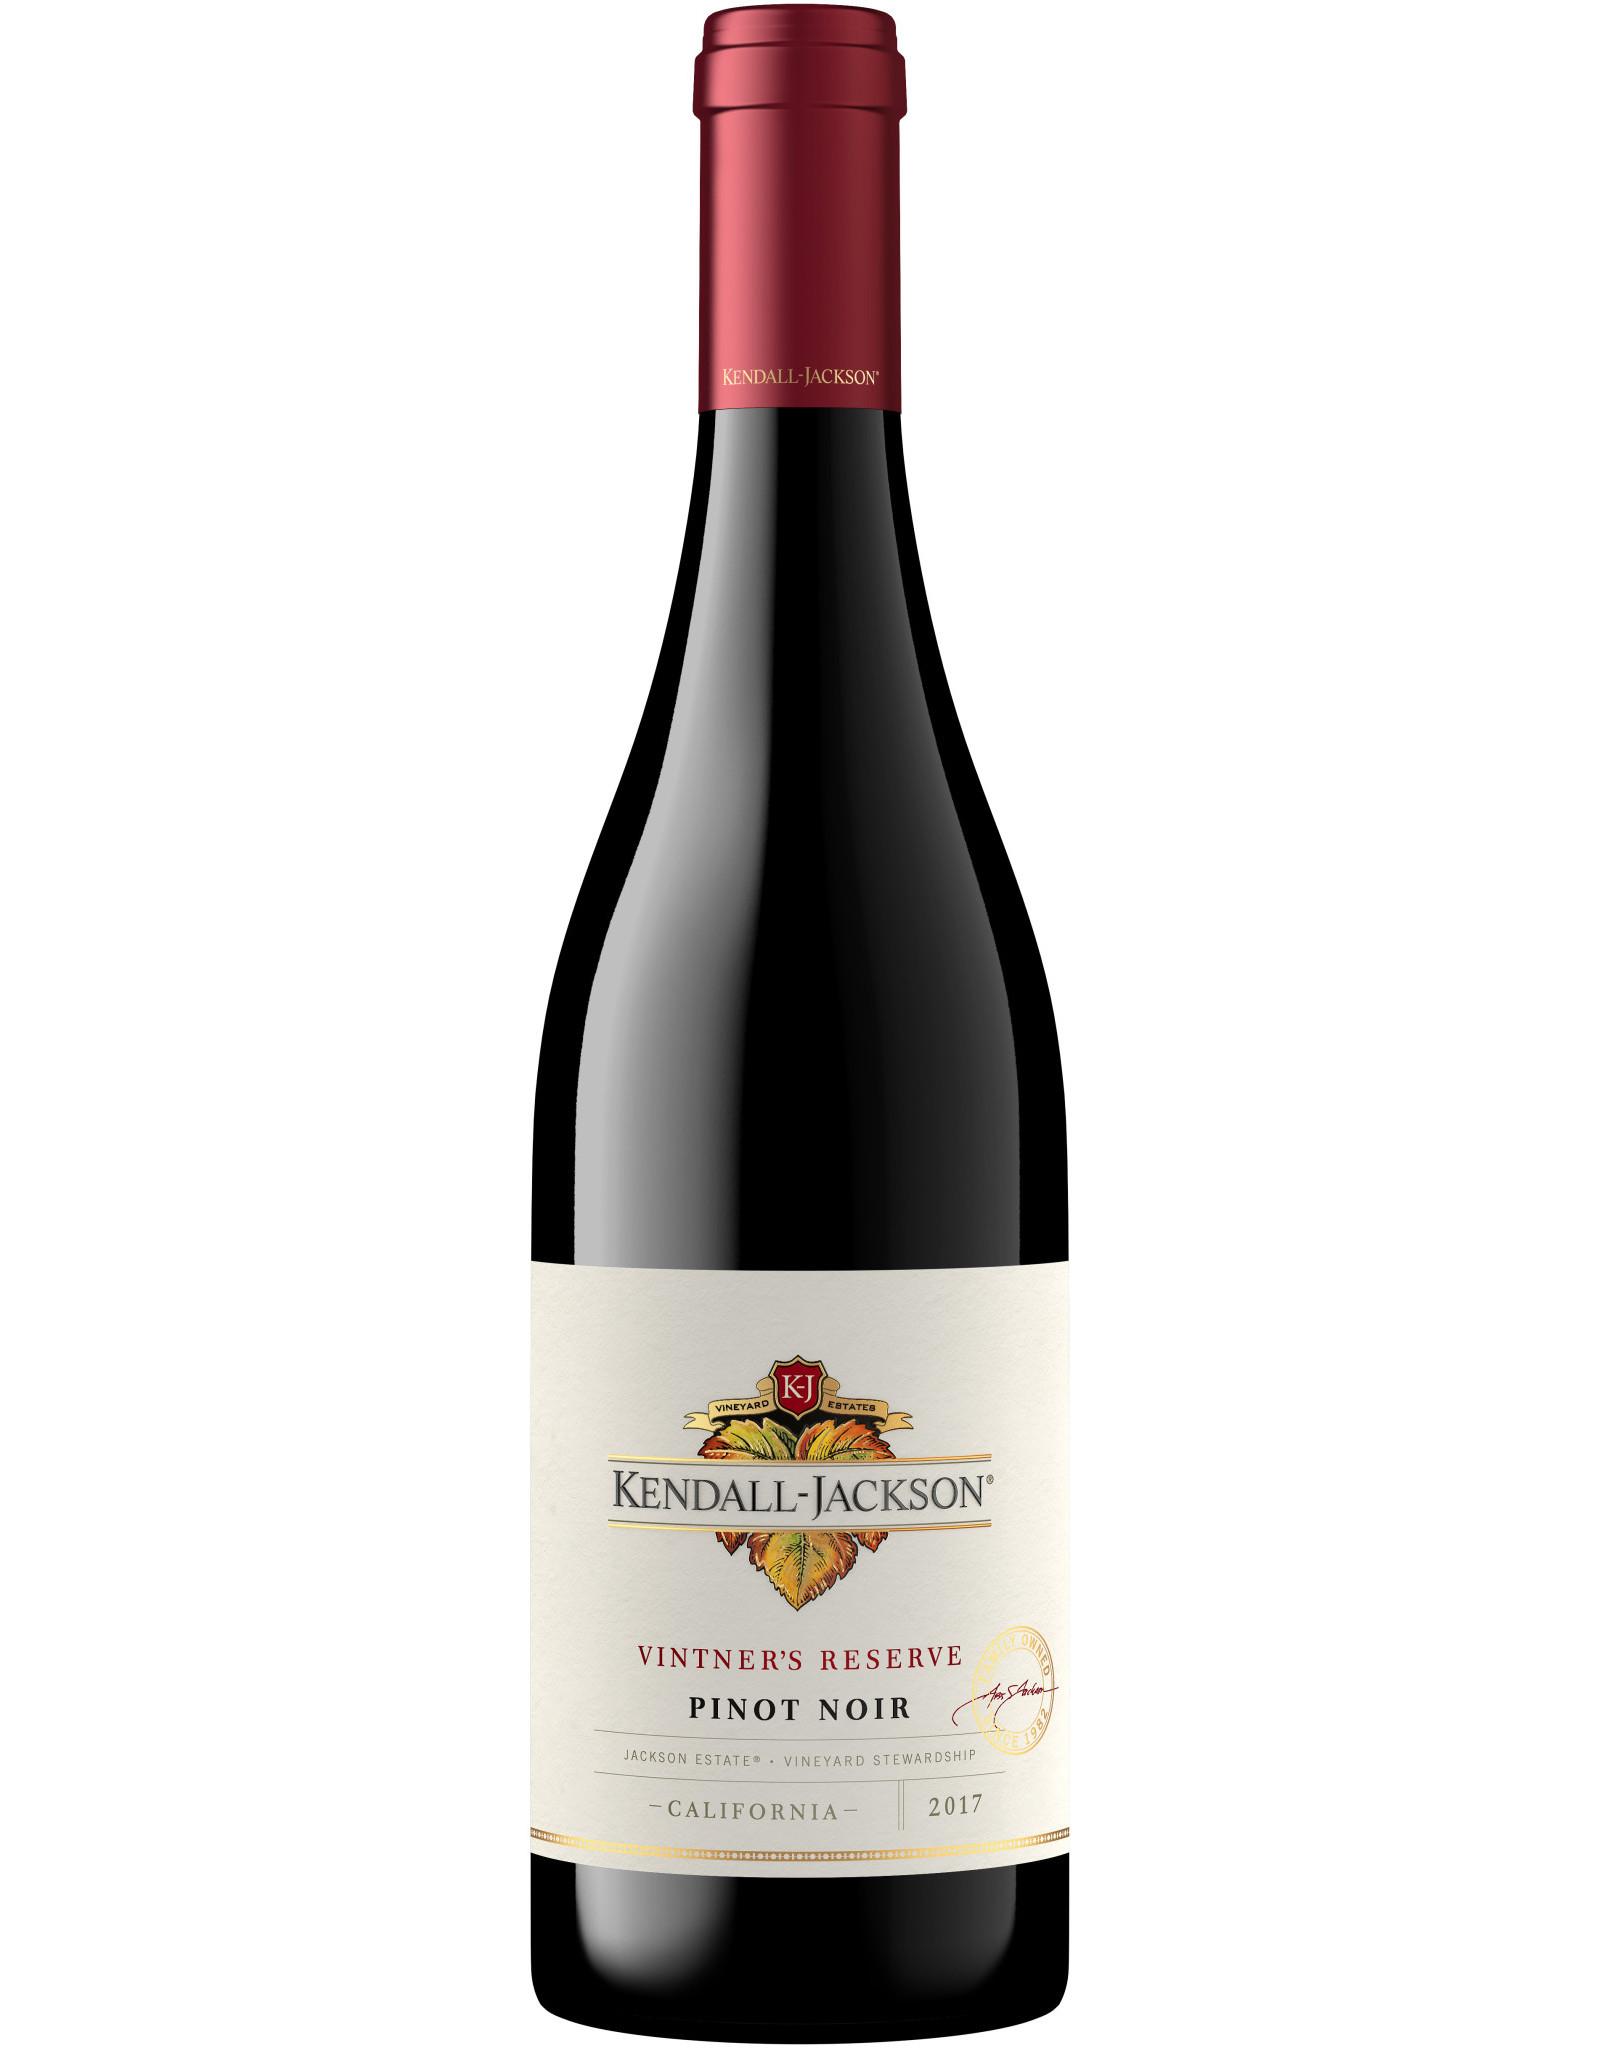 Kendall Jackson Pinot Noir 2016